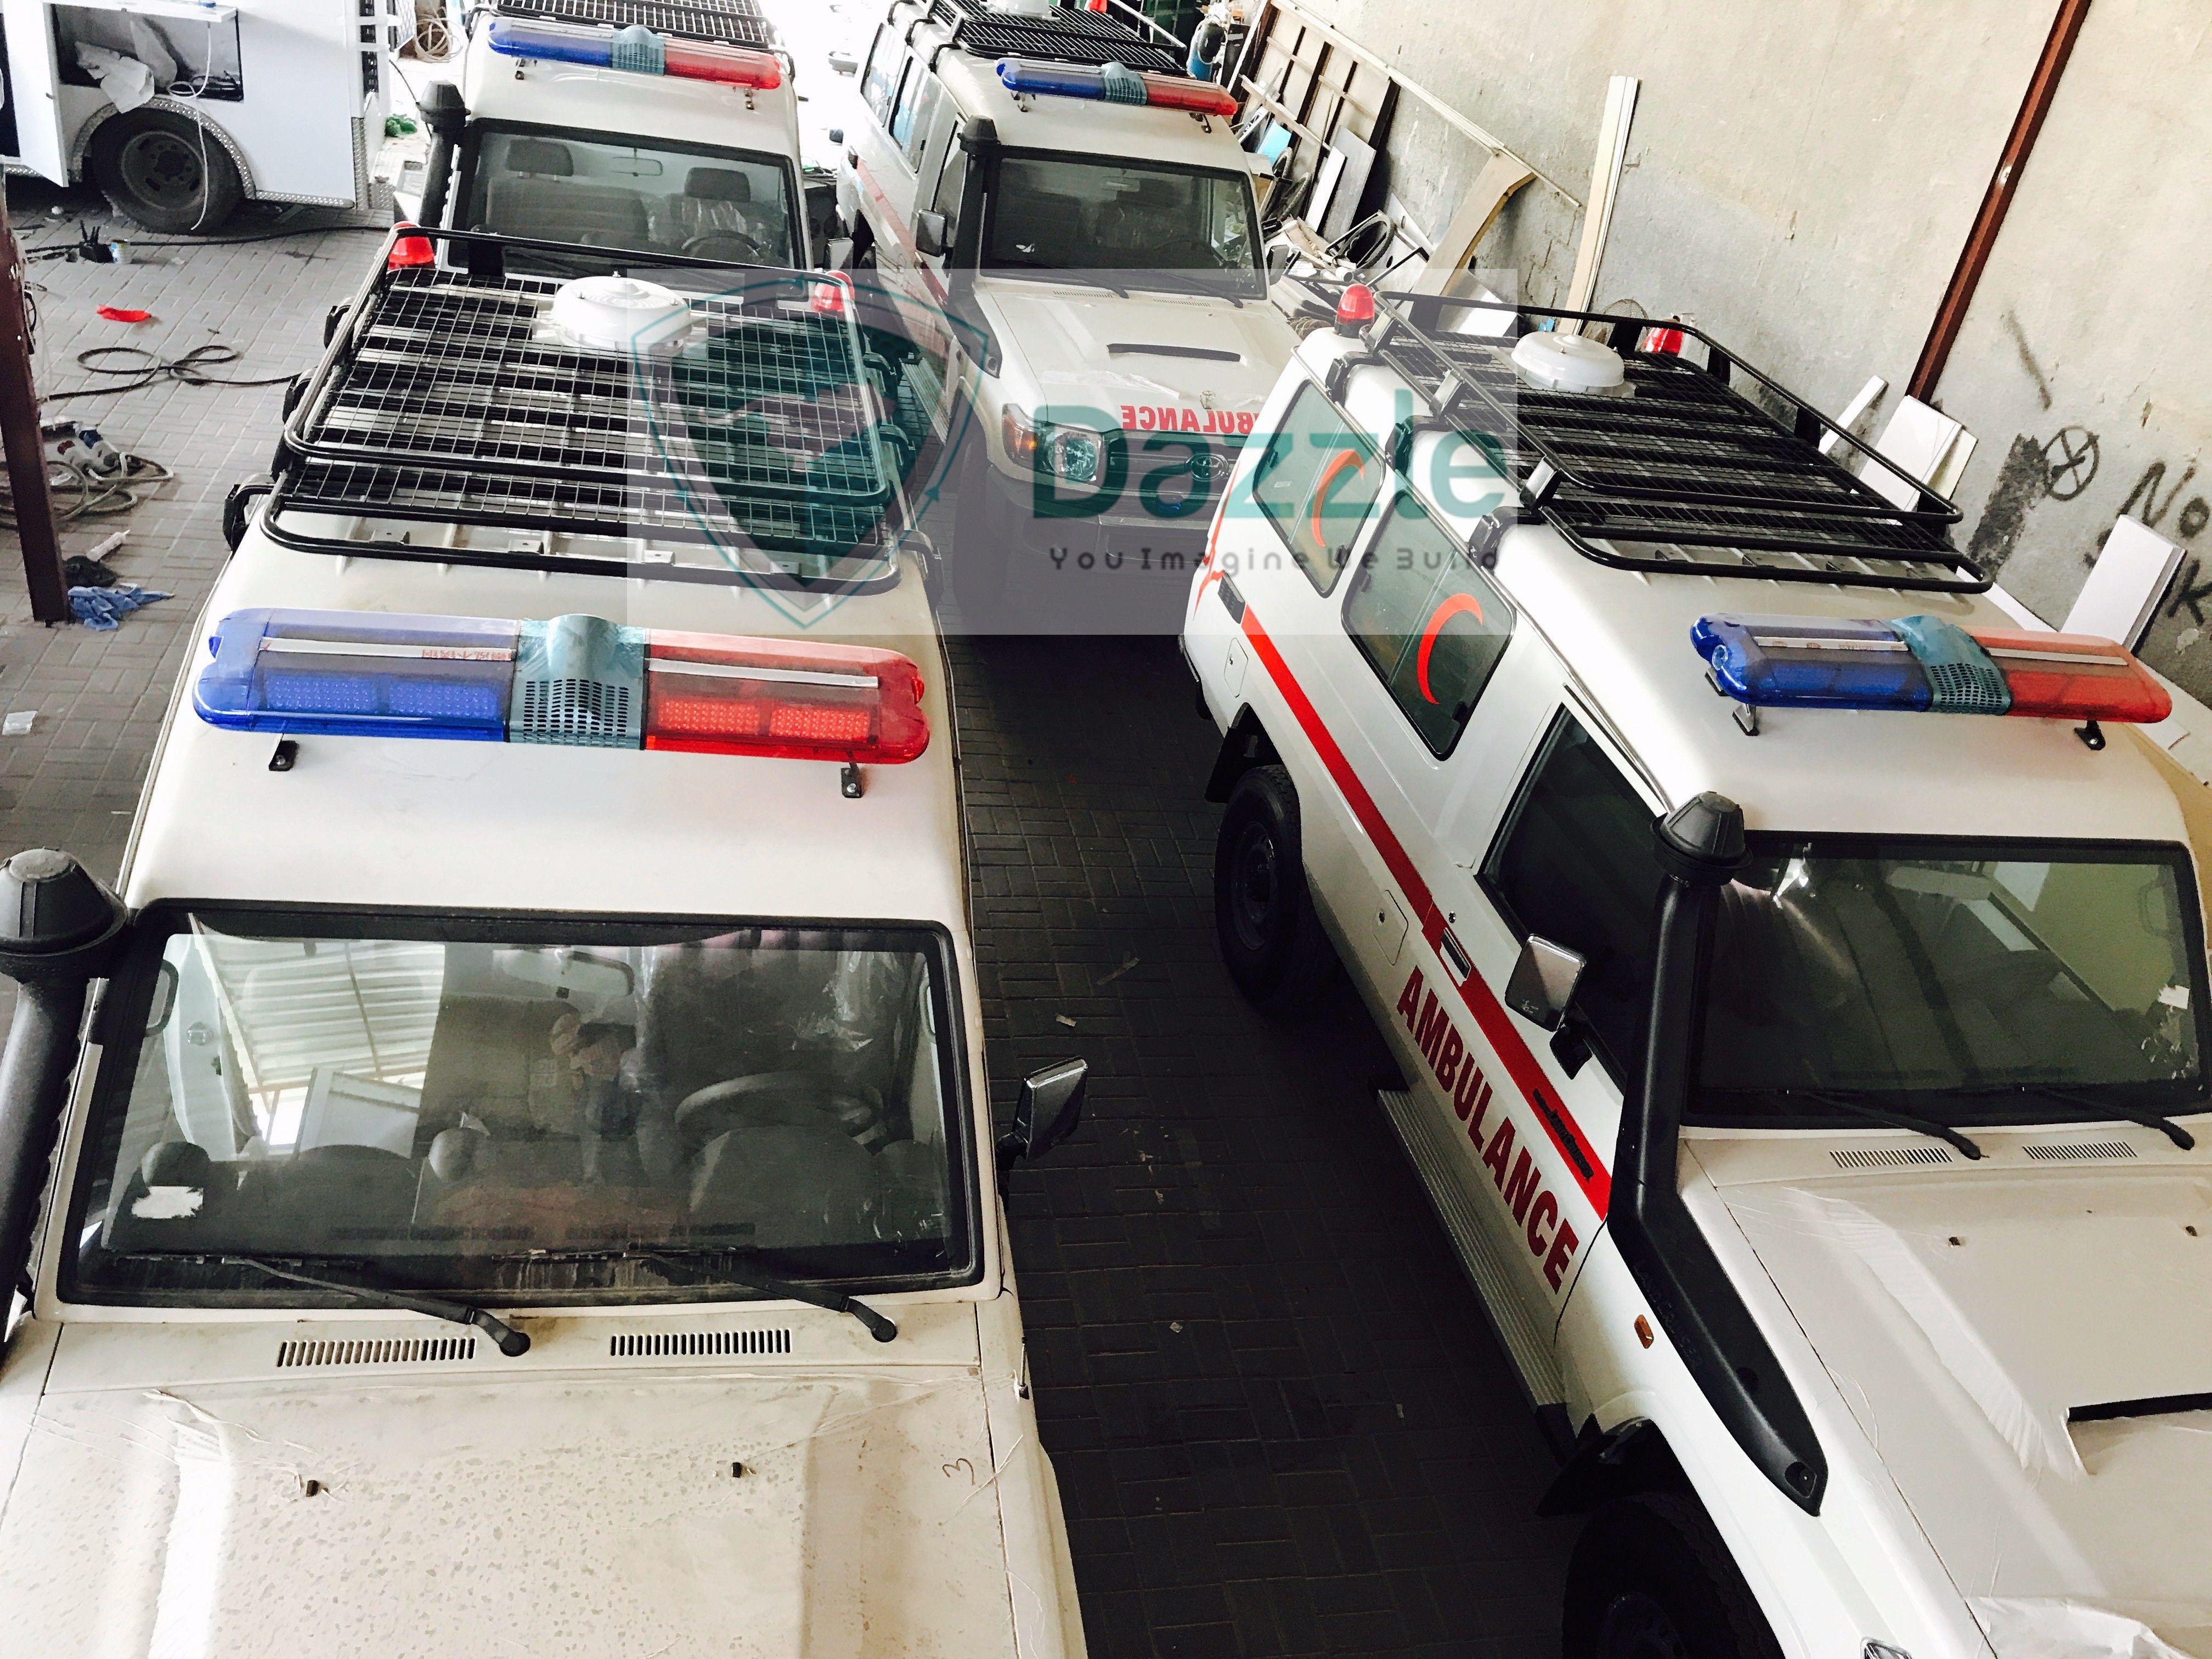 Brand New YM 2018 Toyota Land Cruiser VDJ 78 V8 4.5L Diesel Ambulance  Contact US